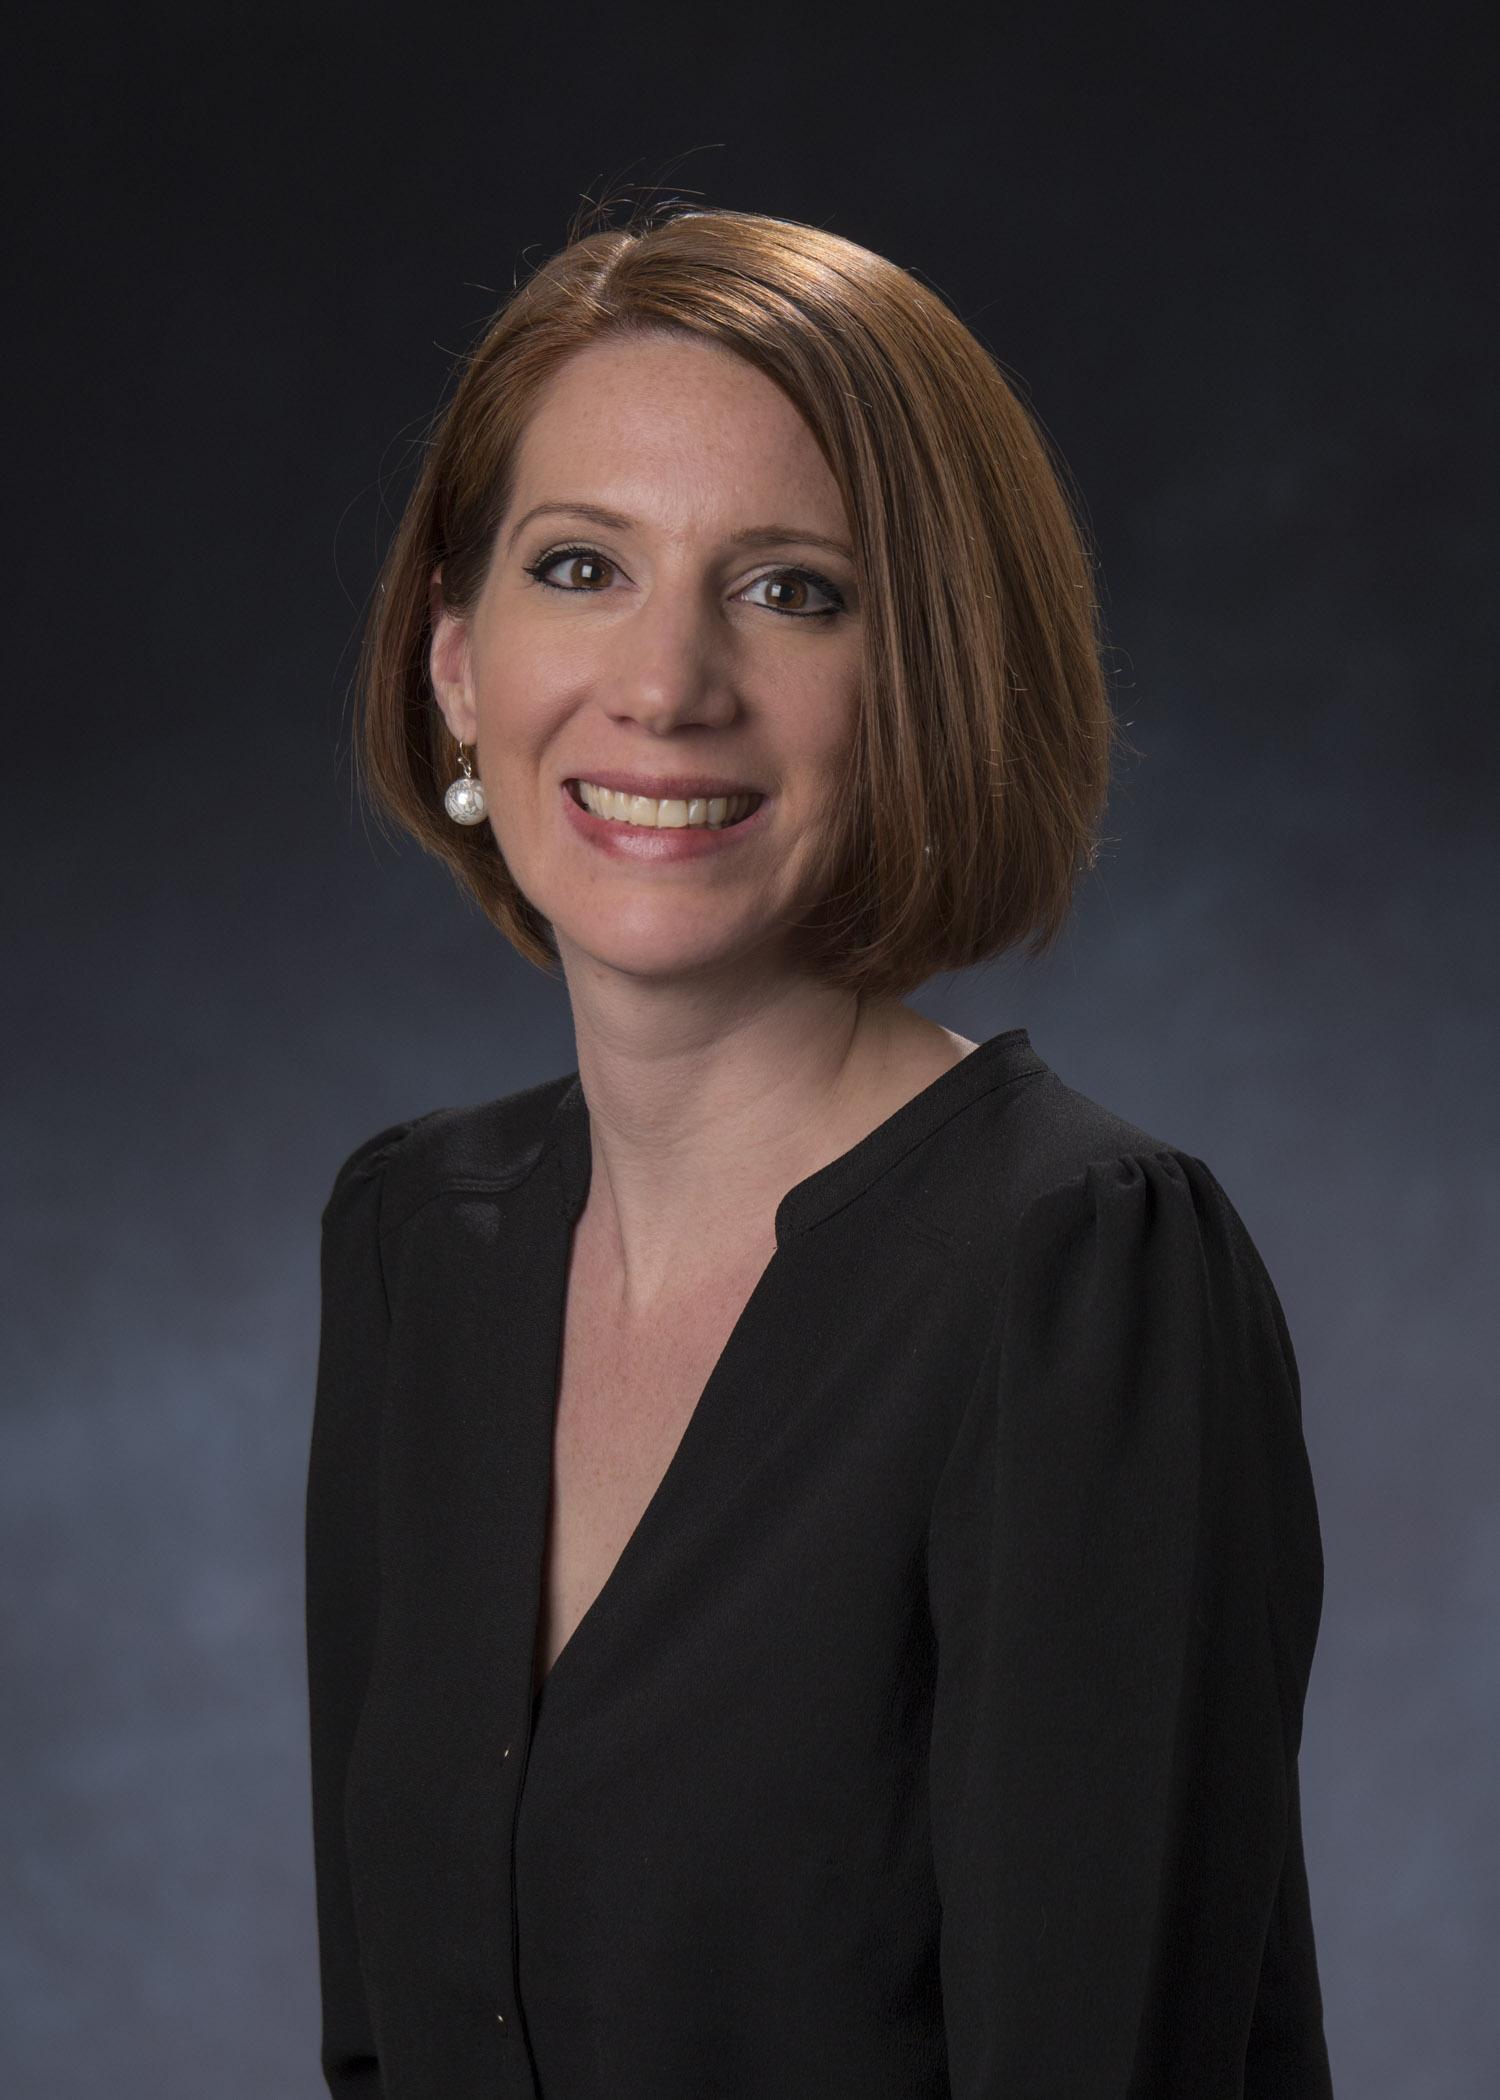 Profile photo of Abbey Lewis